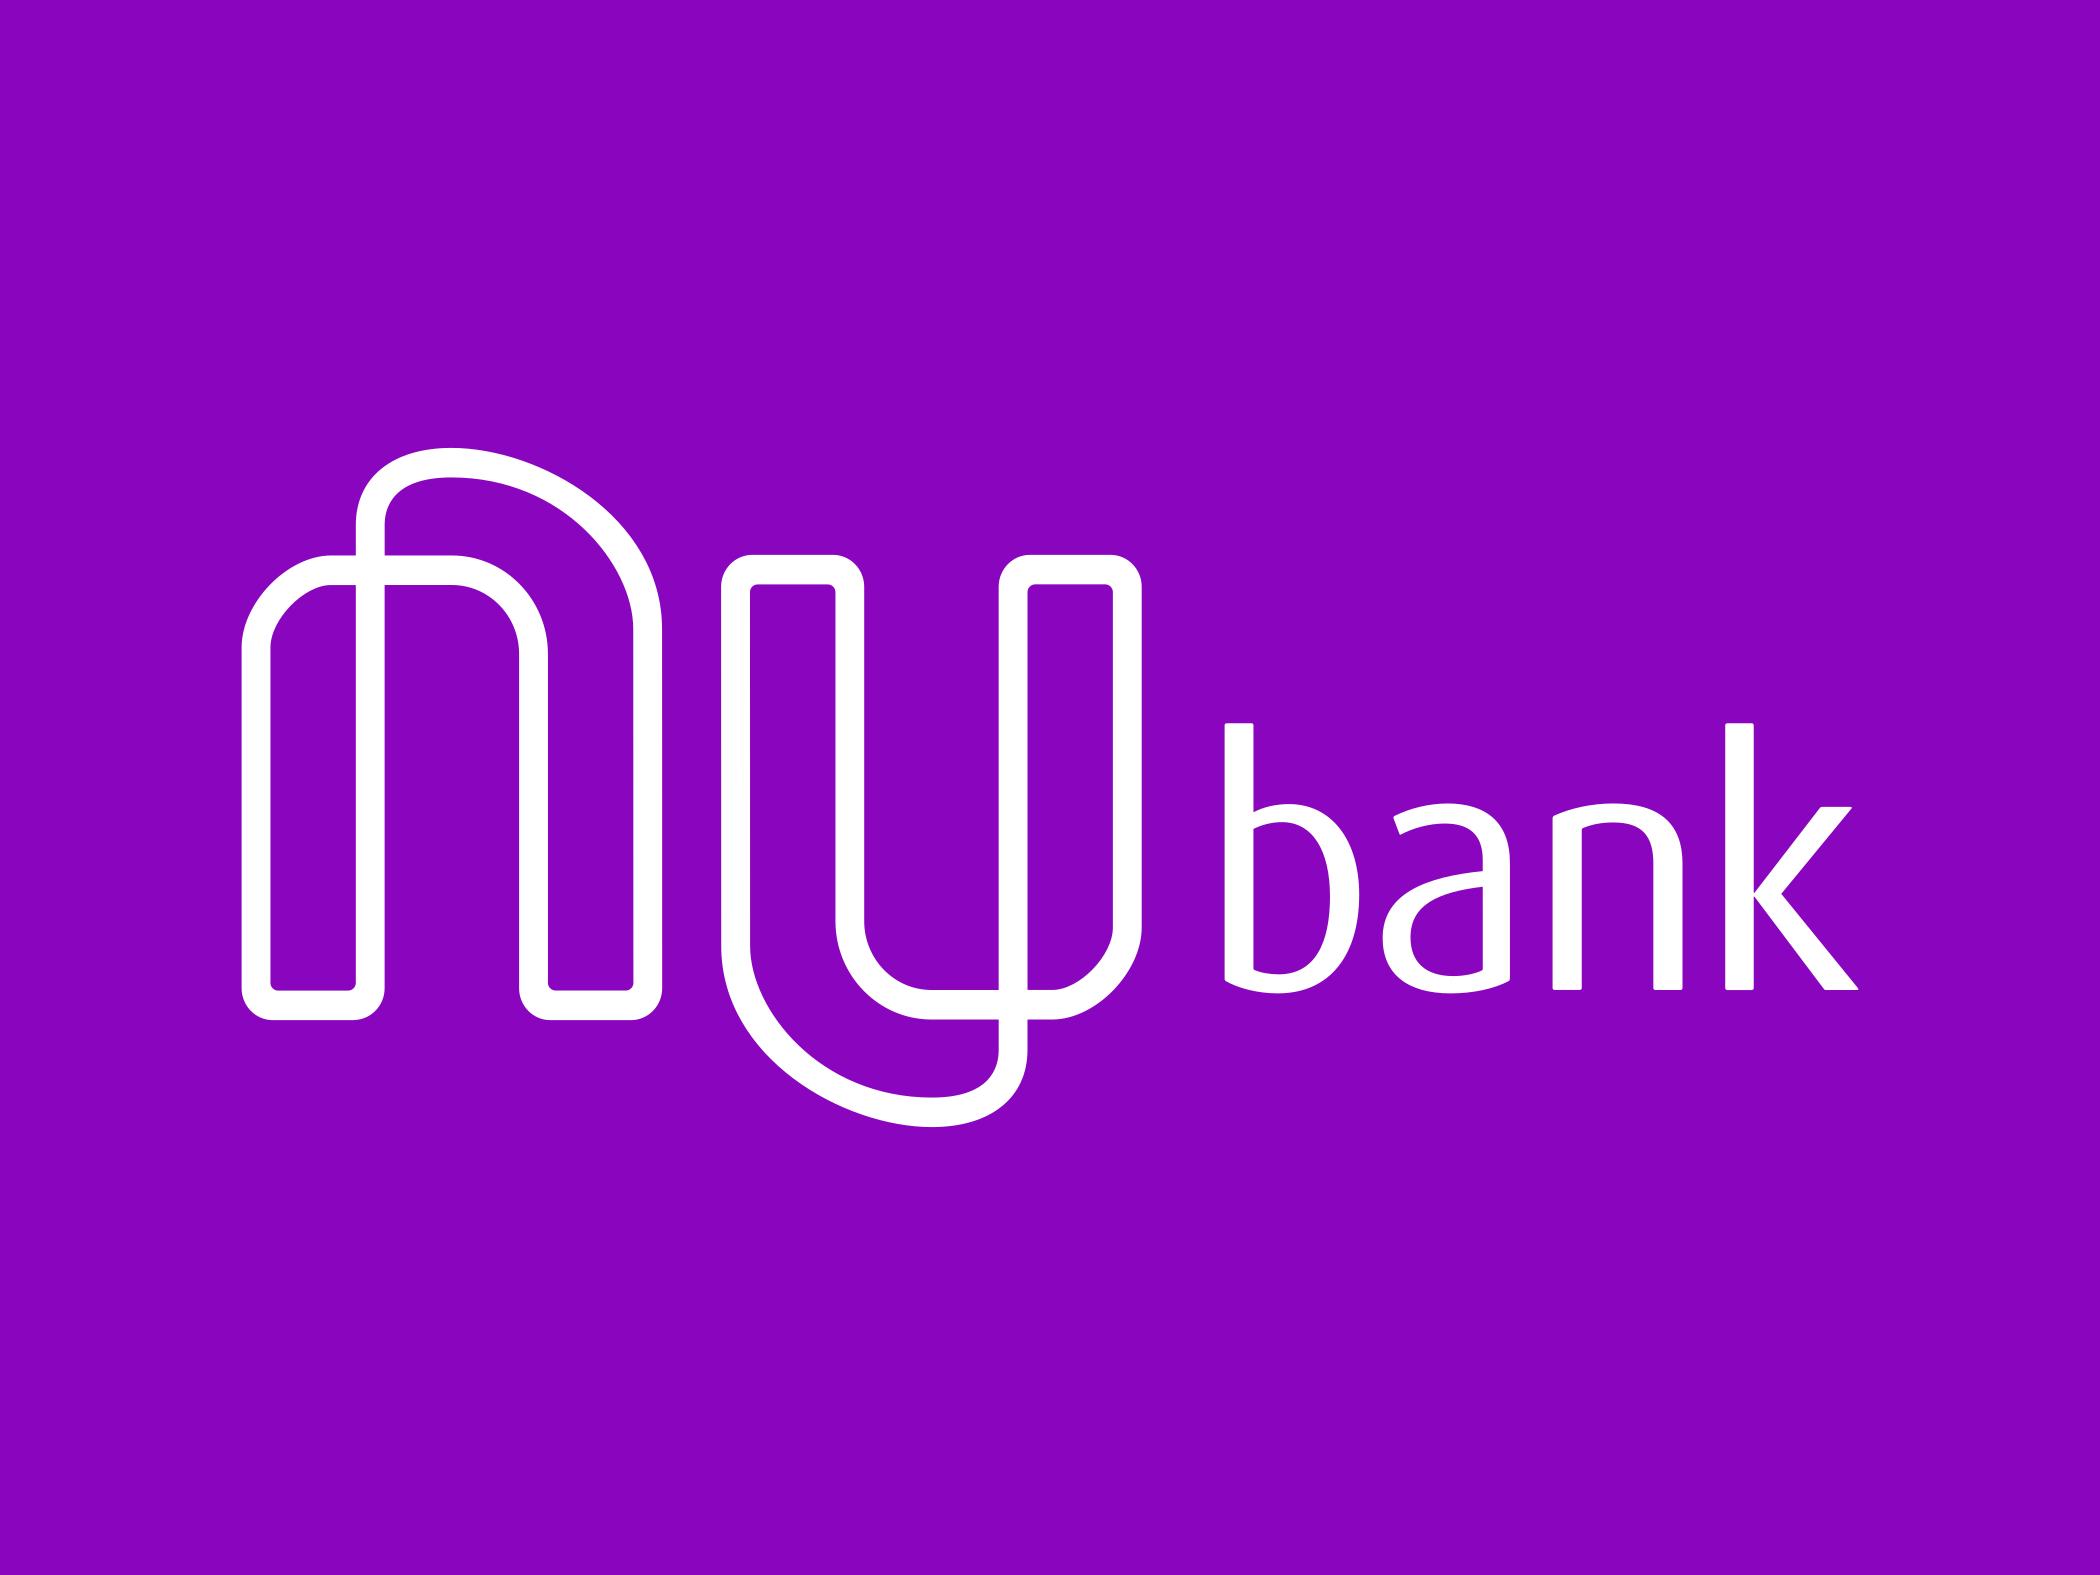 nubank logo 4 - Nubank Logo